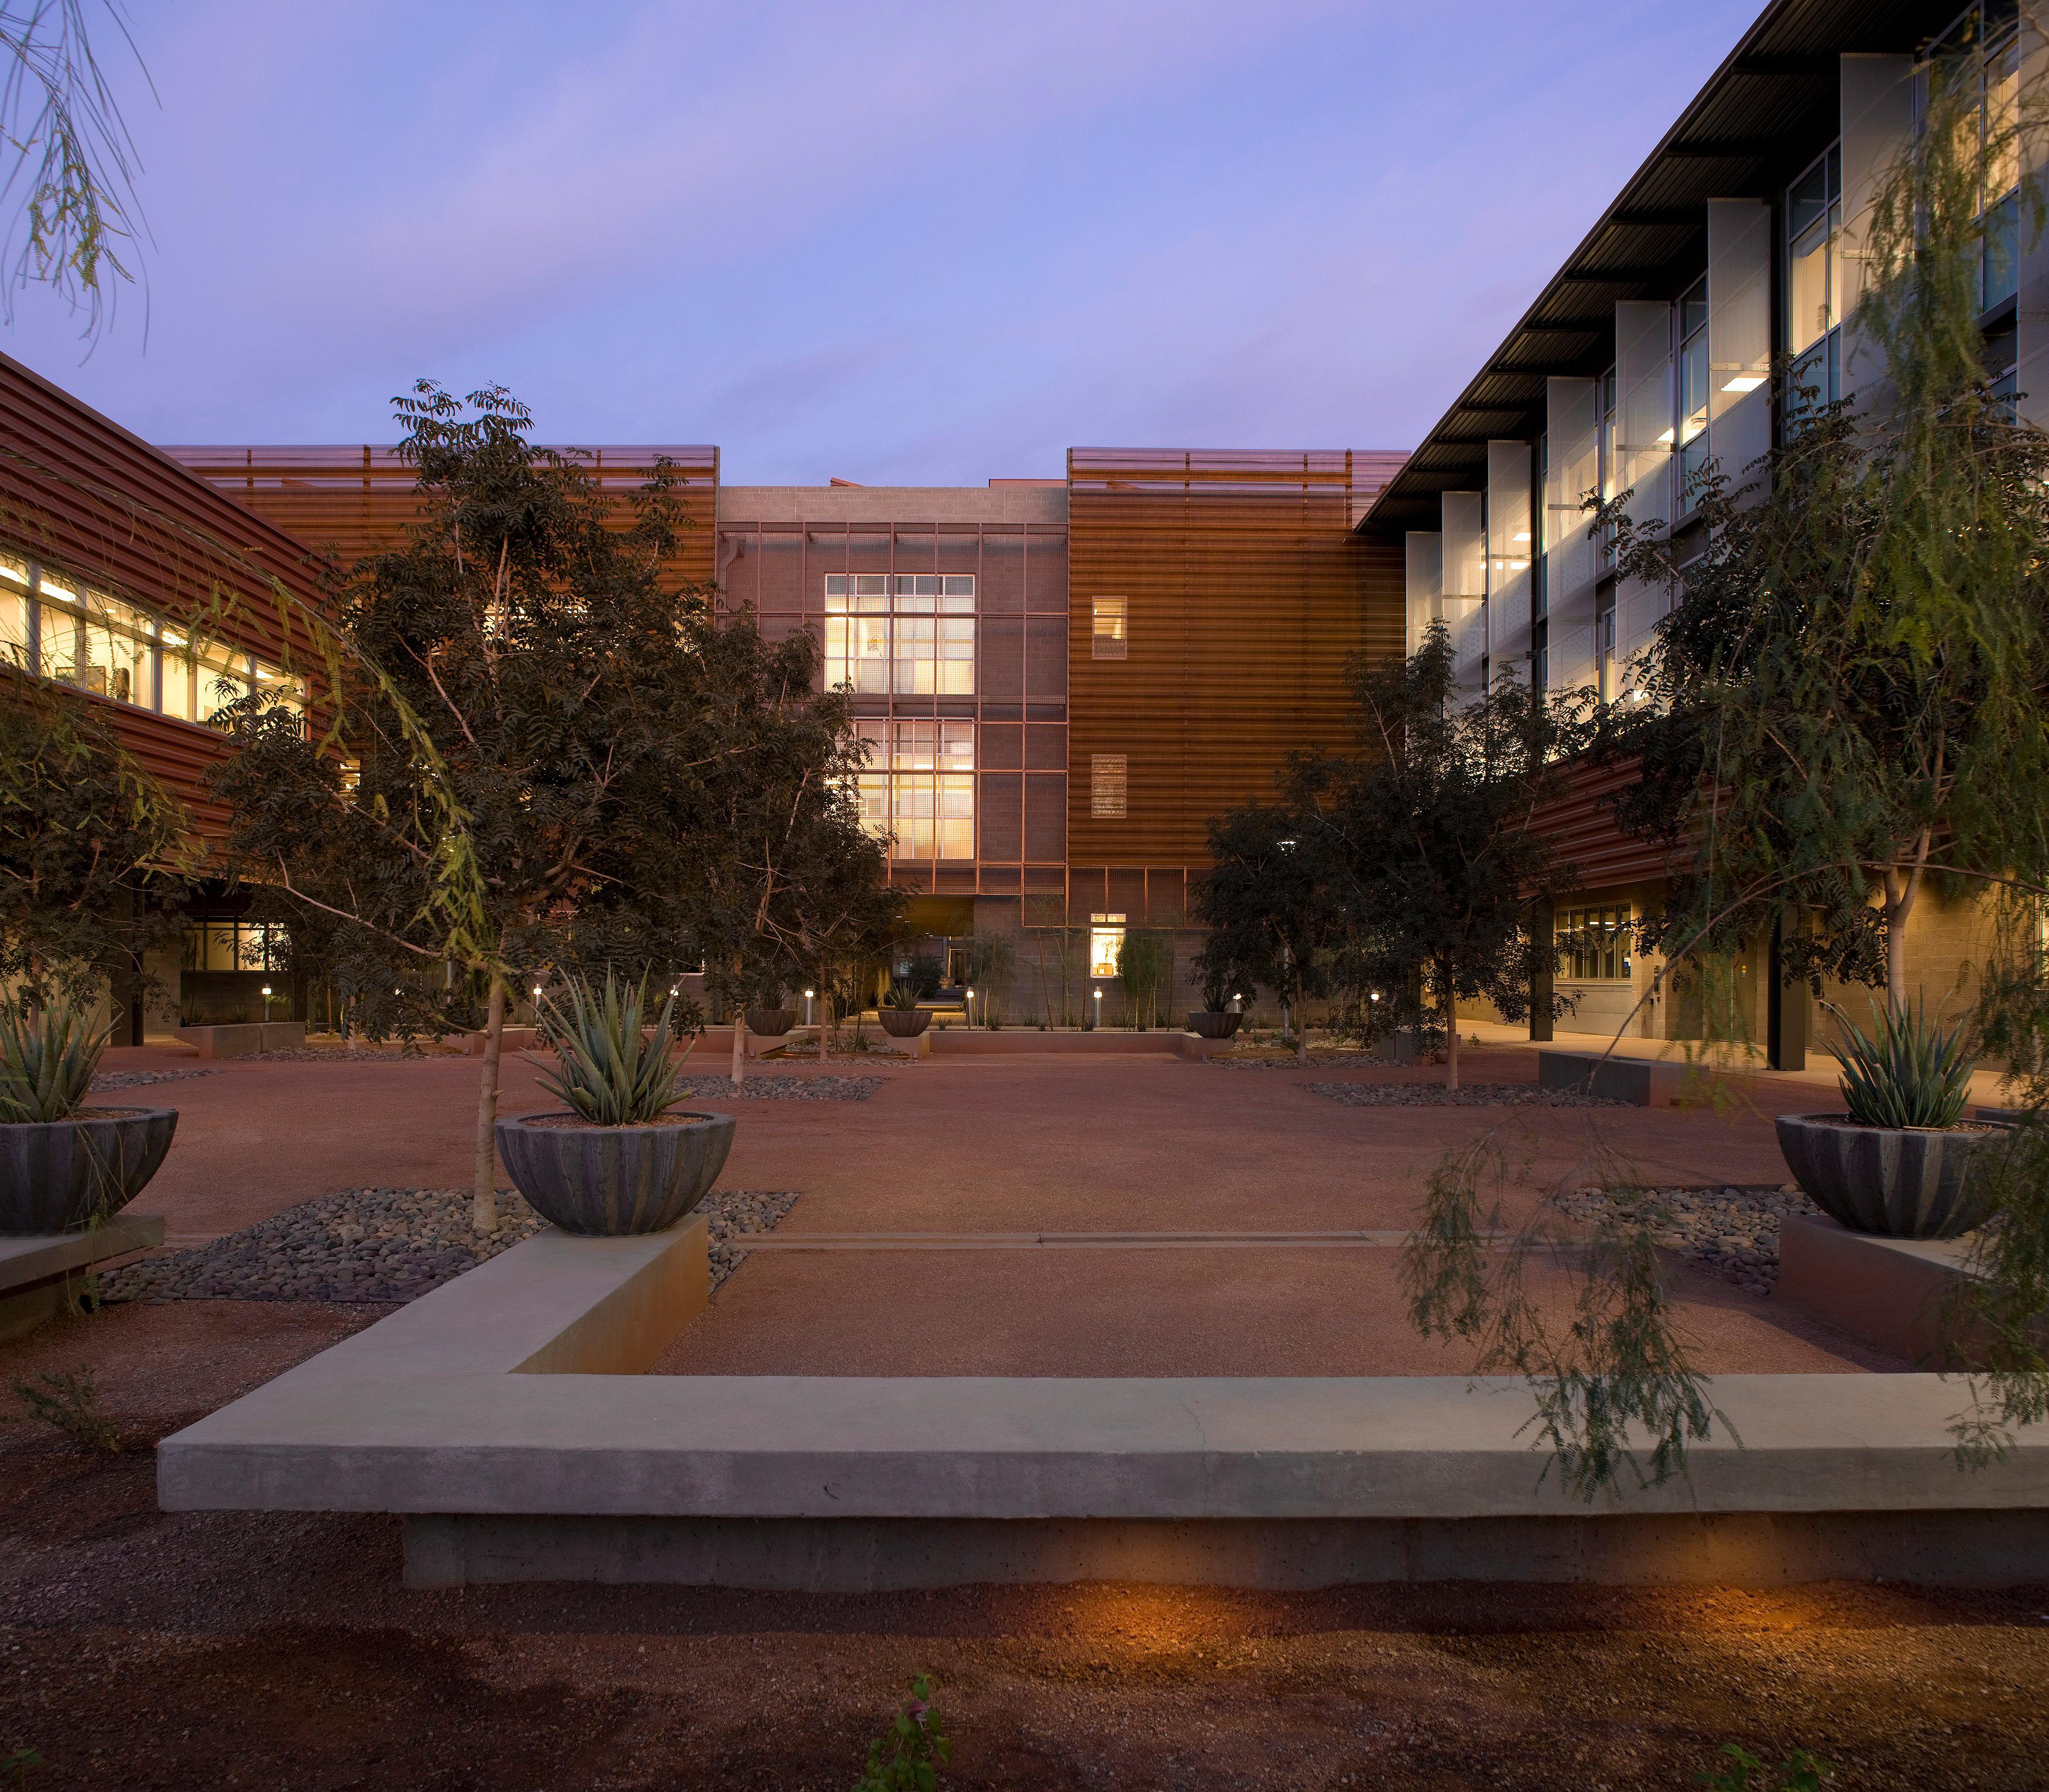 Classroom Design For Recognition ~ Asu polytechnic academic district lake flato